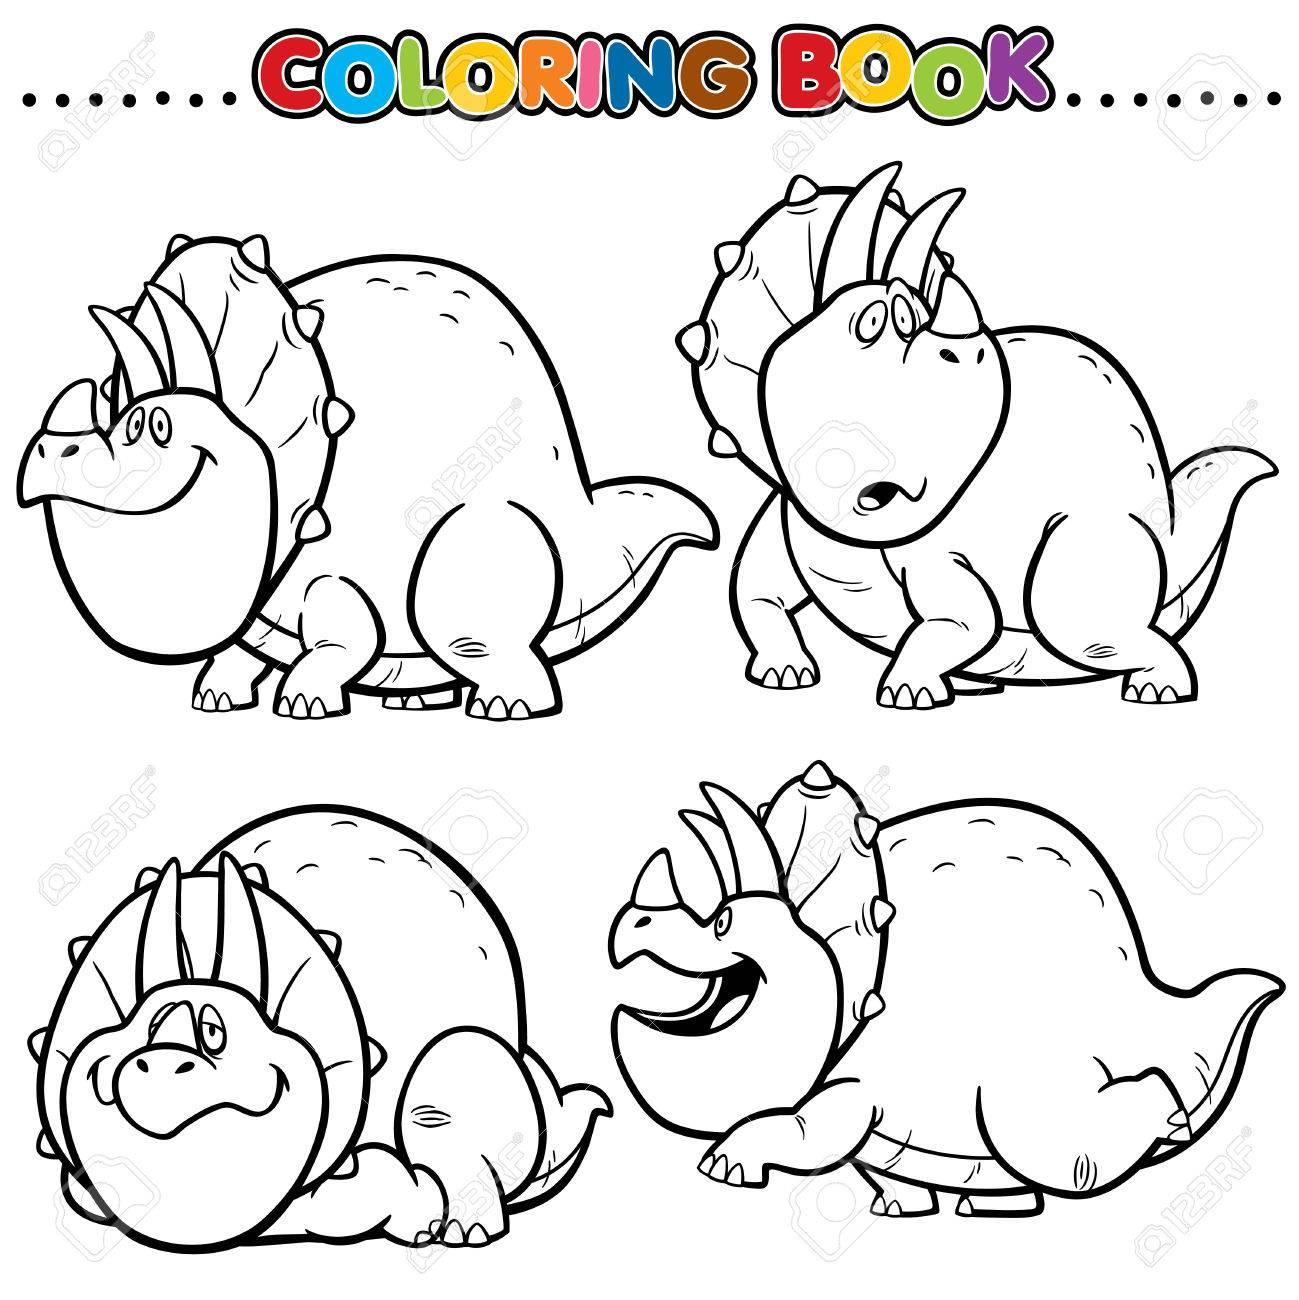 Cartoon Coloring Book - Dinosaurs Character Royalty Free Cliparts ...